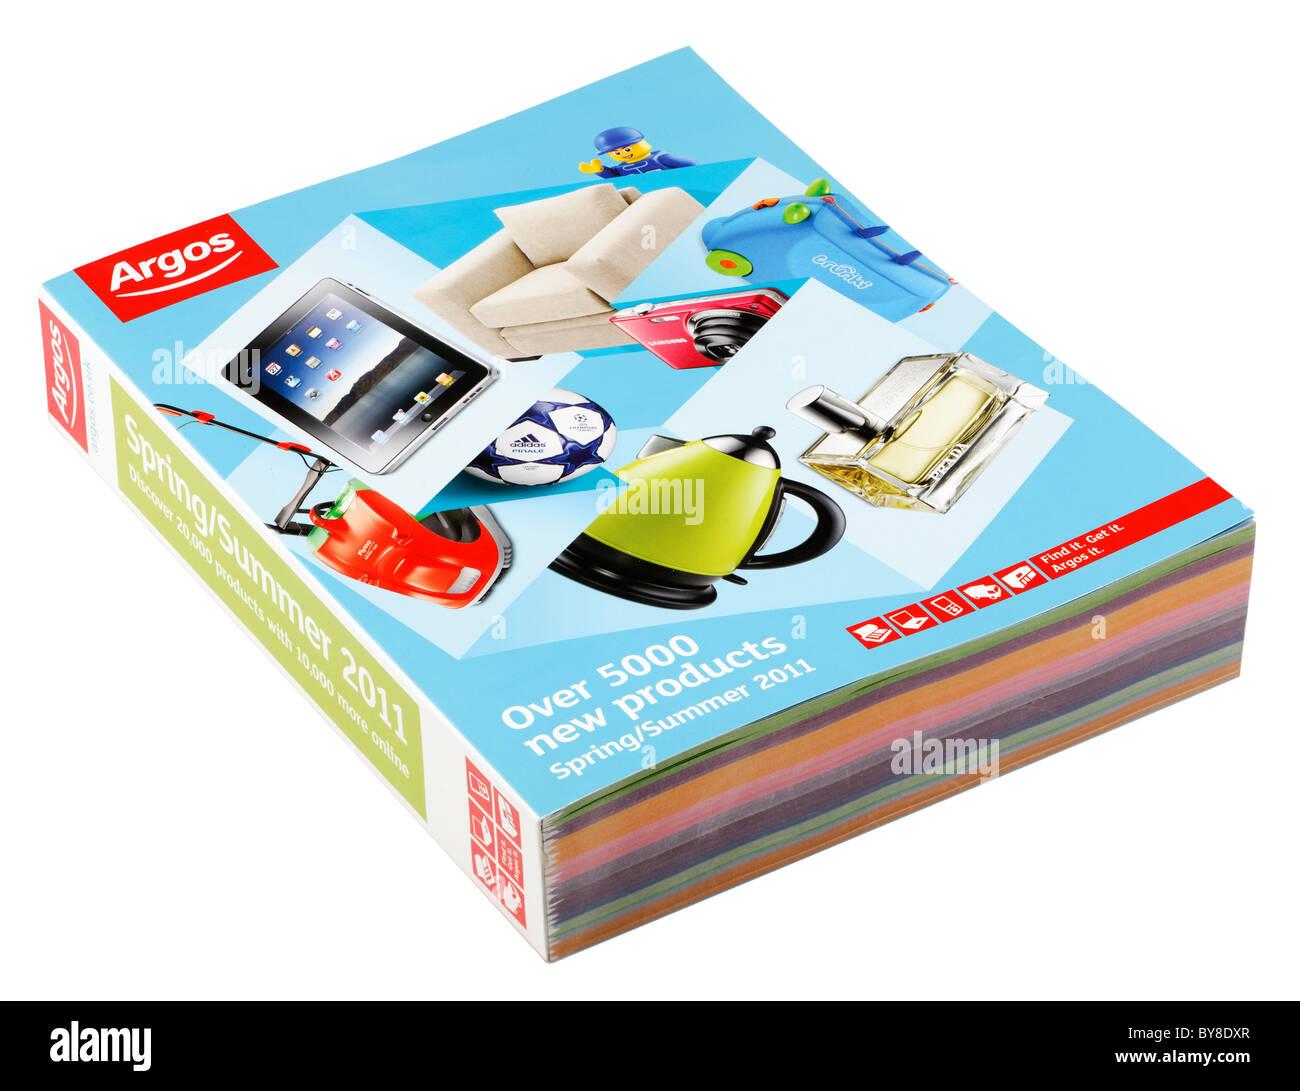 White apron argos - Argos Catalog For Spring Summer 2011 Stock Image